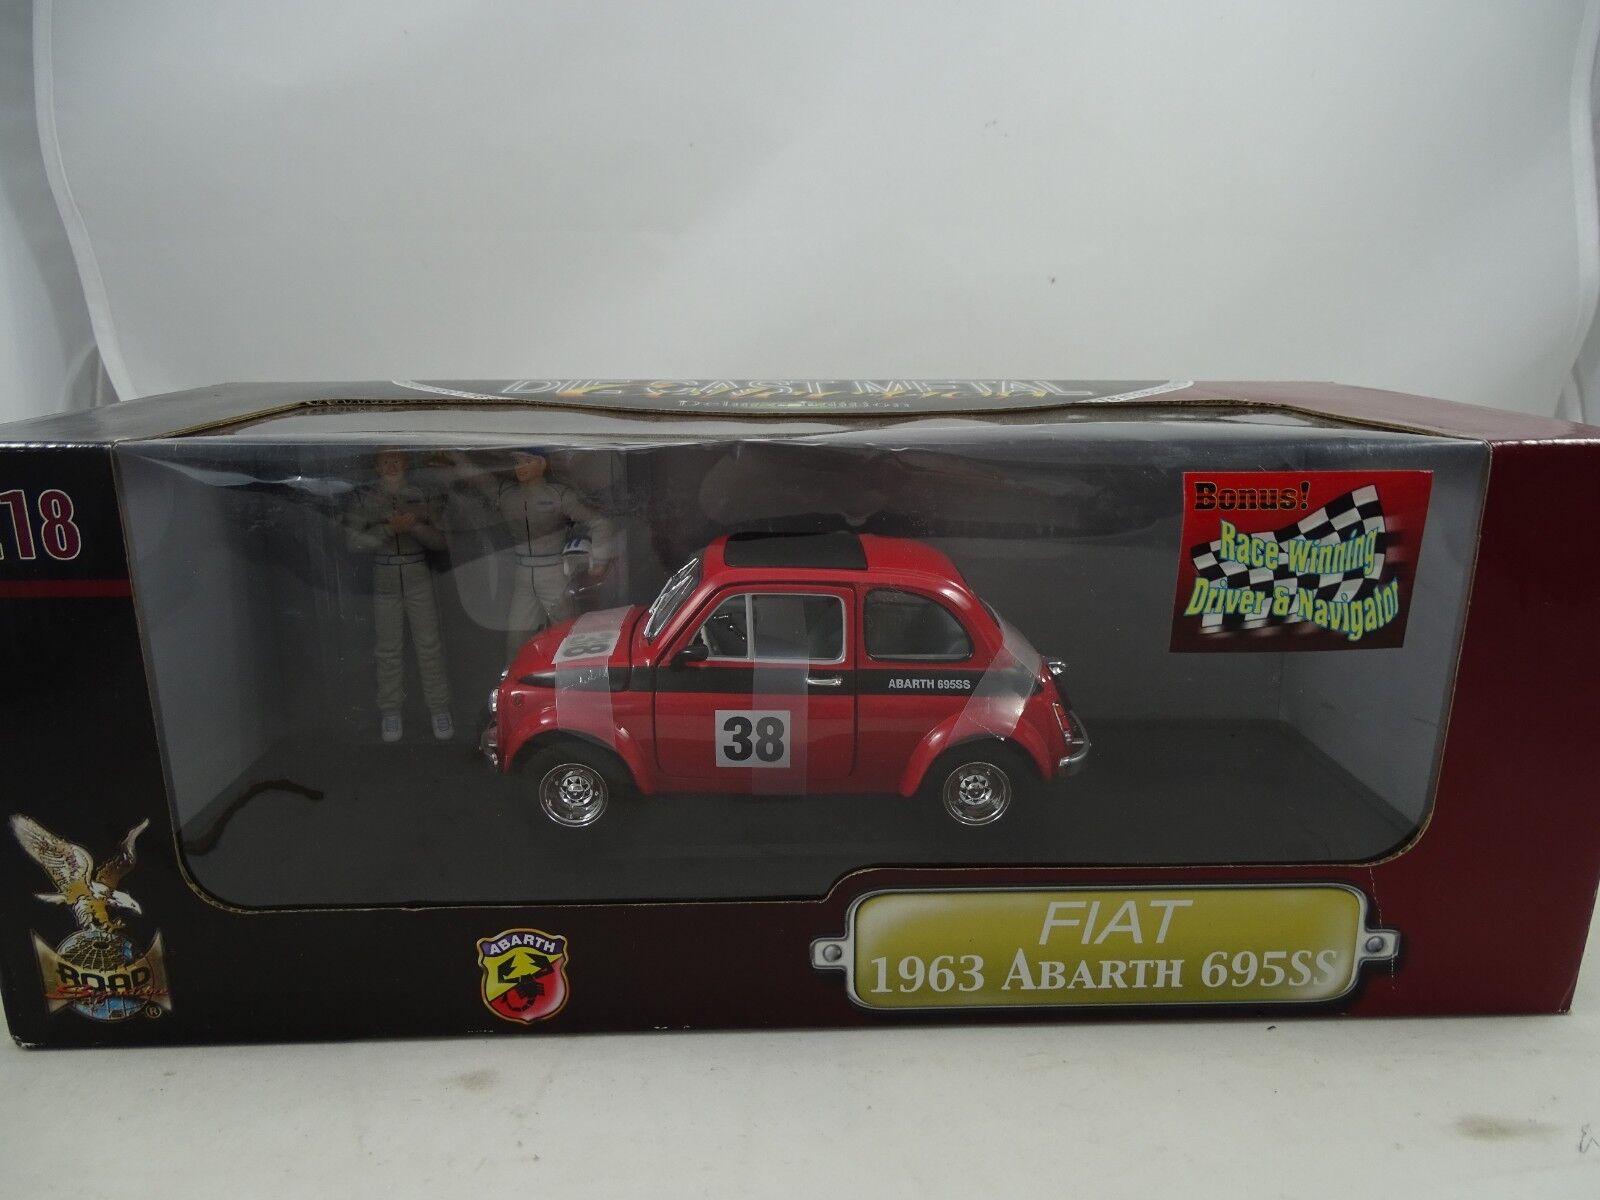 1 18  Road Signature  92338f - FIAT 1963 ABARTH 695ss  38 + figures-RARE  pour pas cher